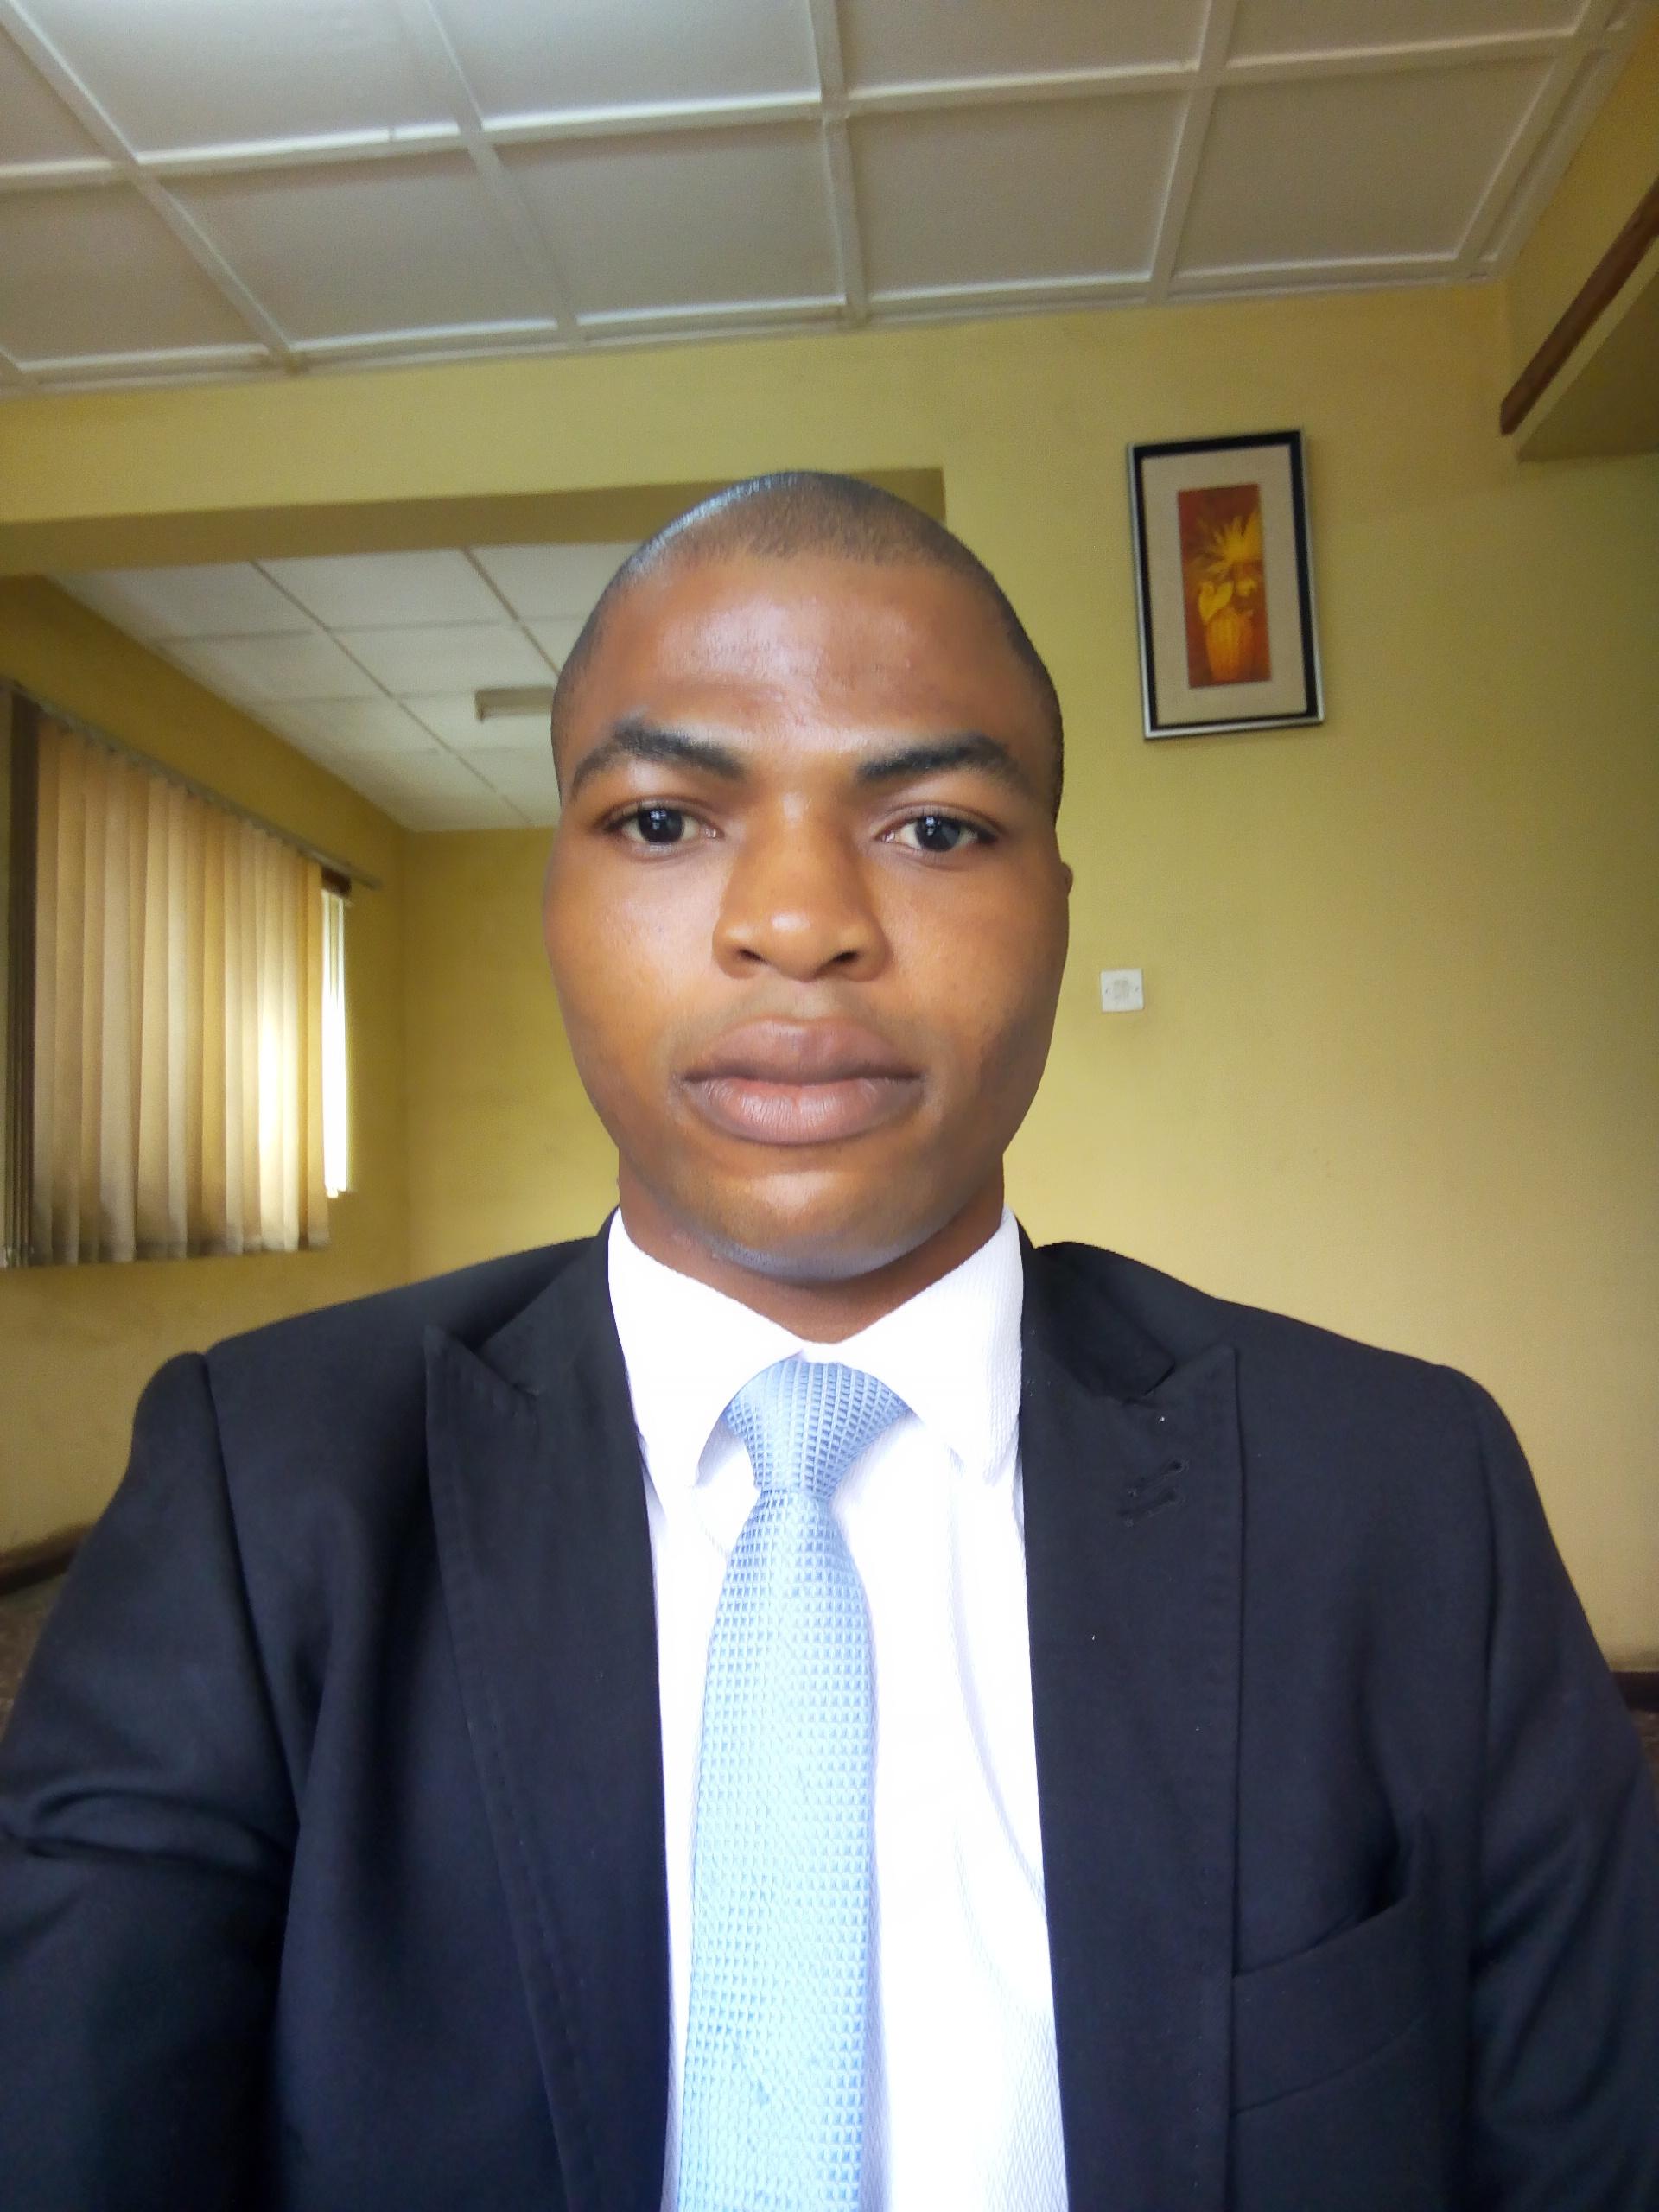 Ibitoye Segun Emmanuel